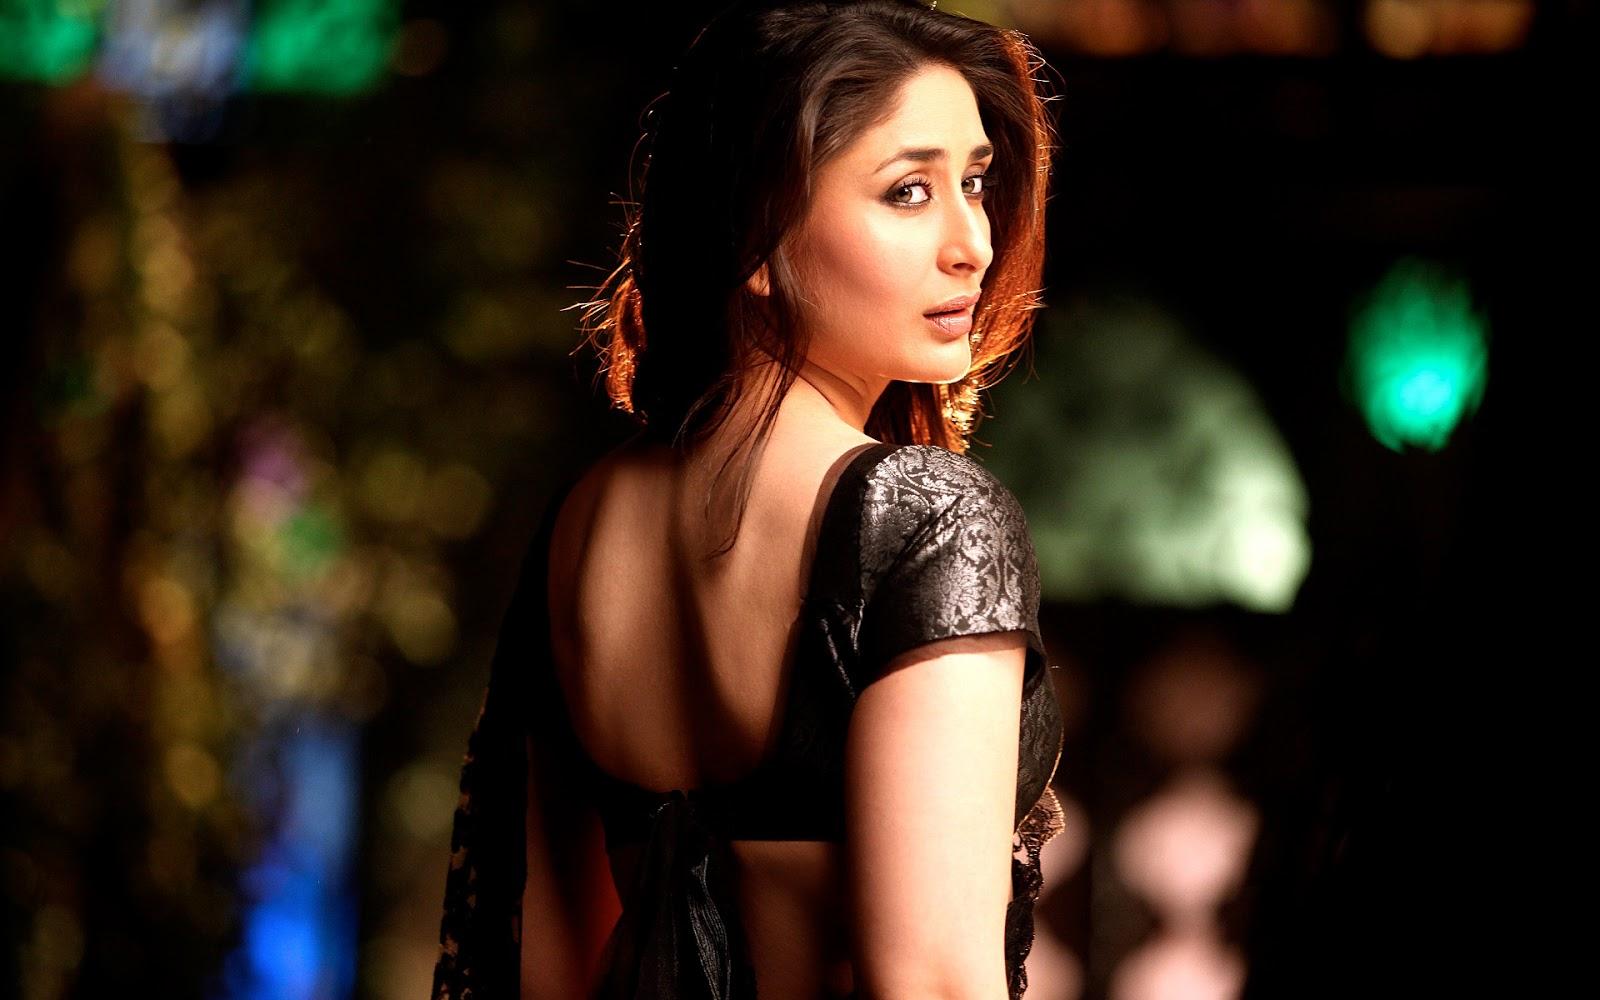 Loli Videos Kareena Kapoor Hot Bollywood Acctresss-9985